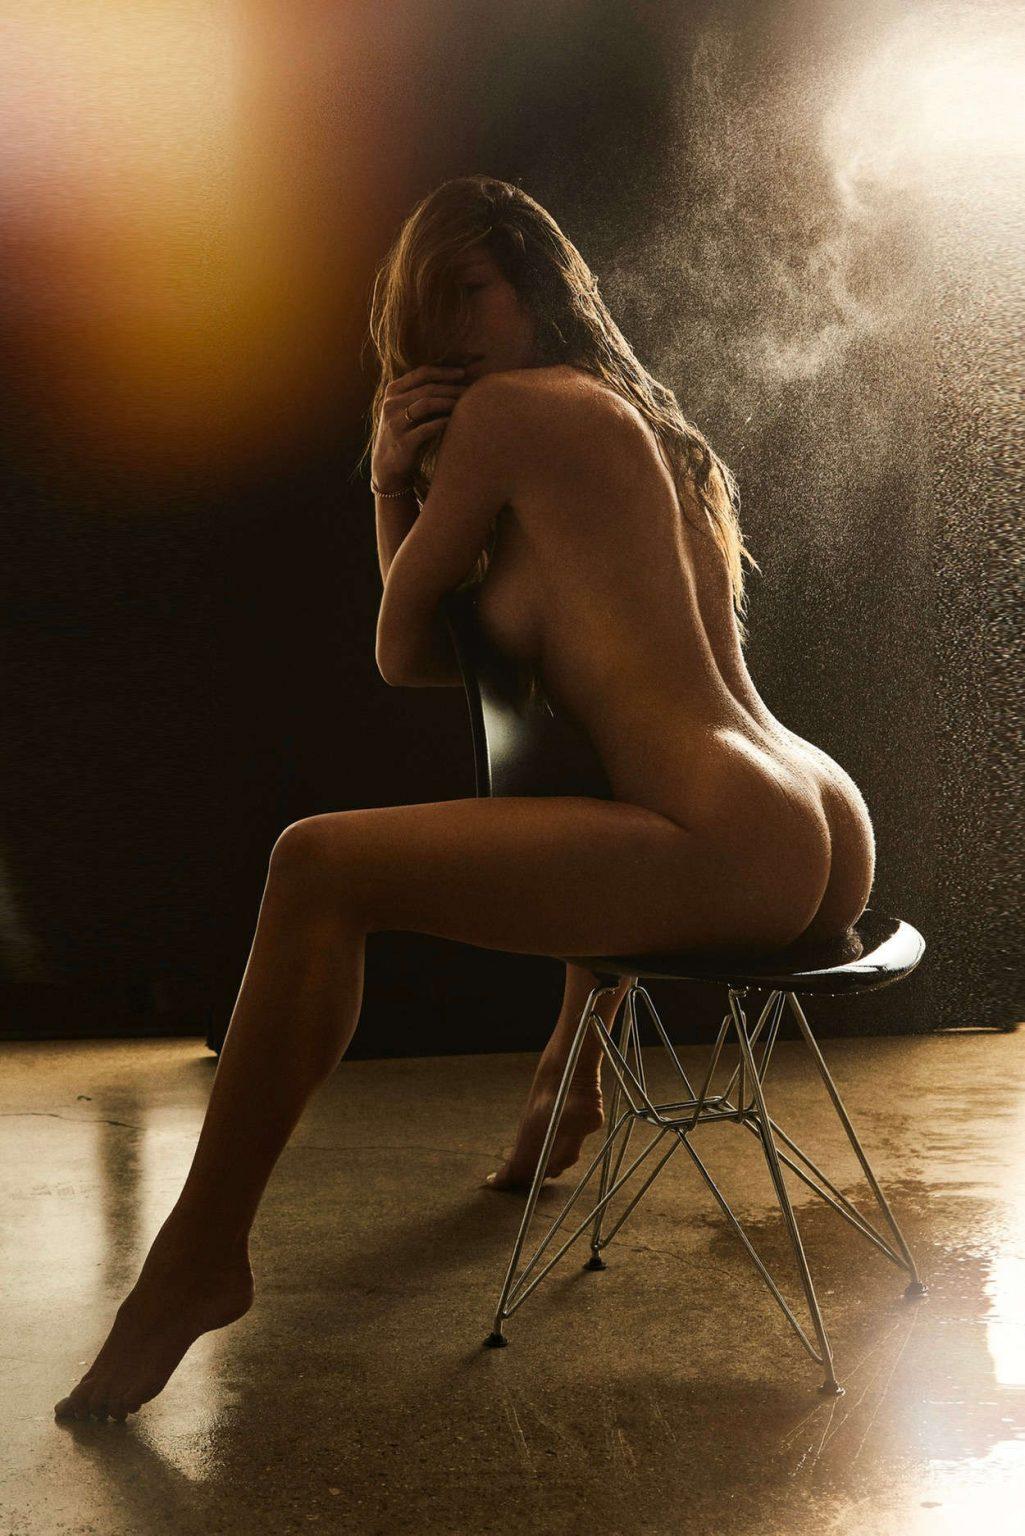 Fit-Naked-Girls-com-Cherokee-Luker-nude-fit-45-1025x1536